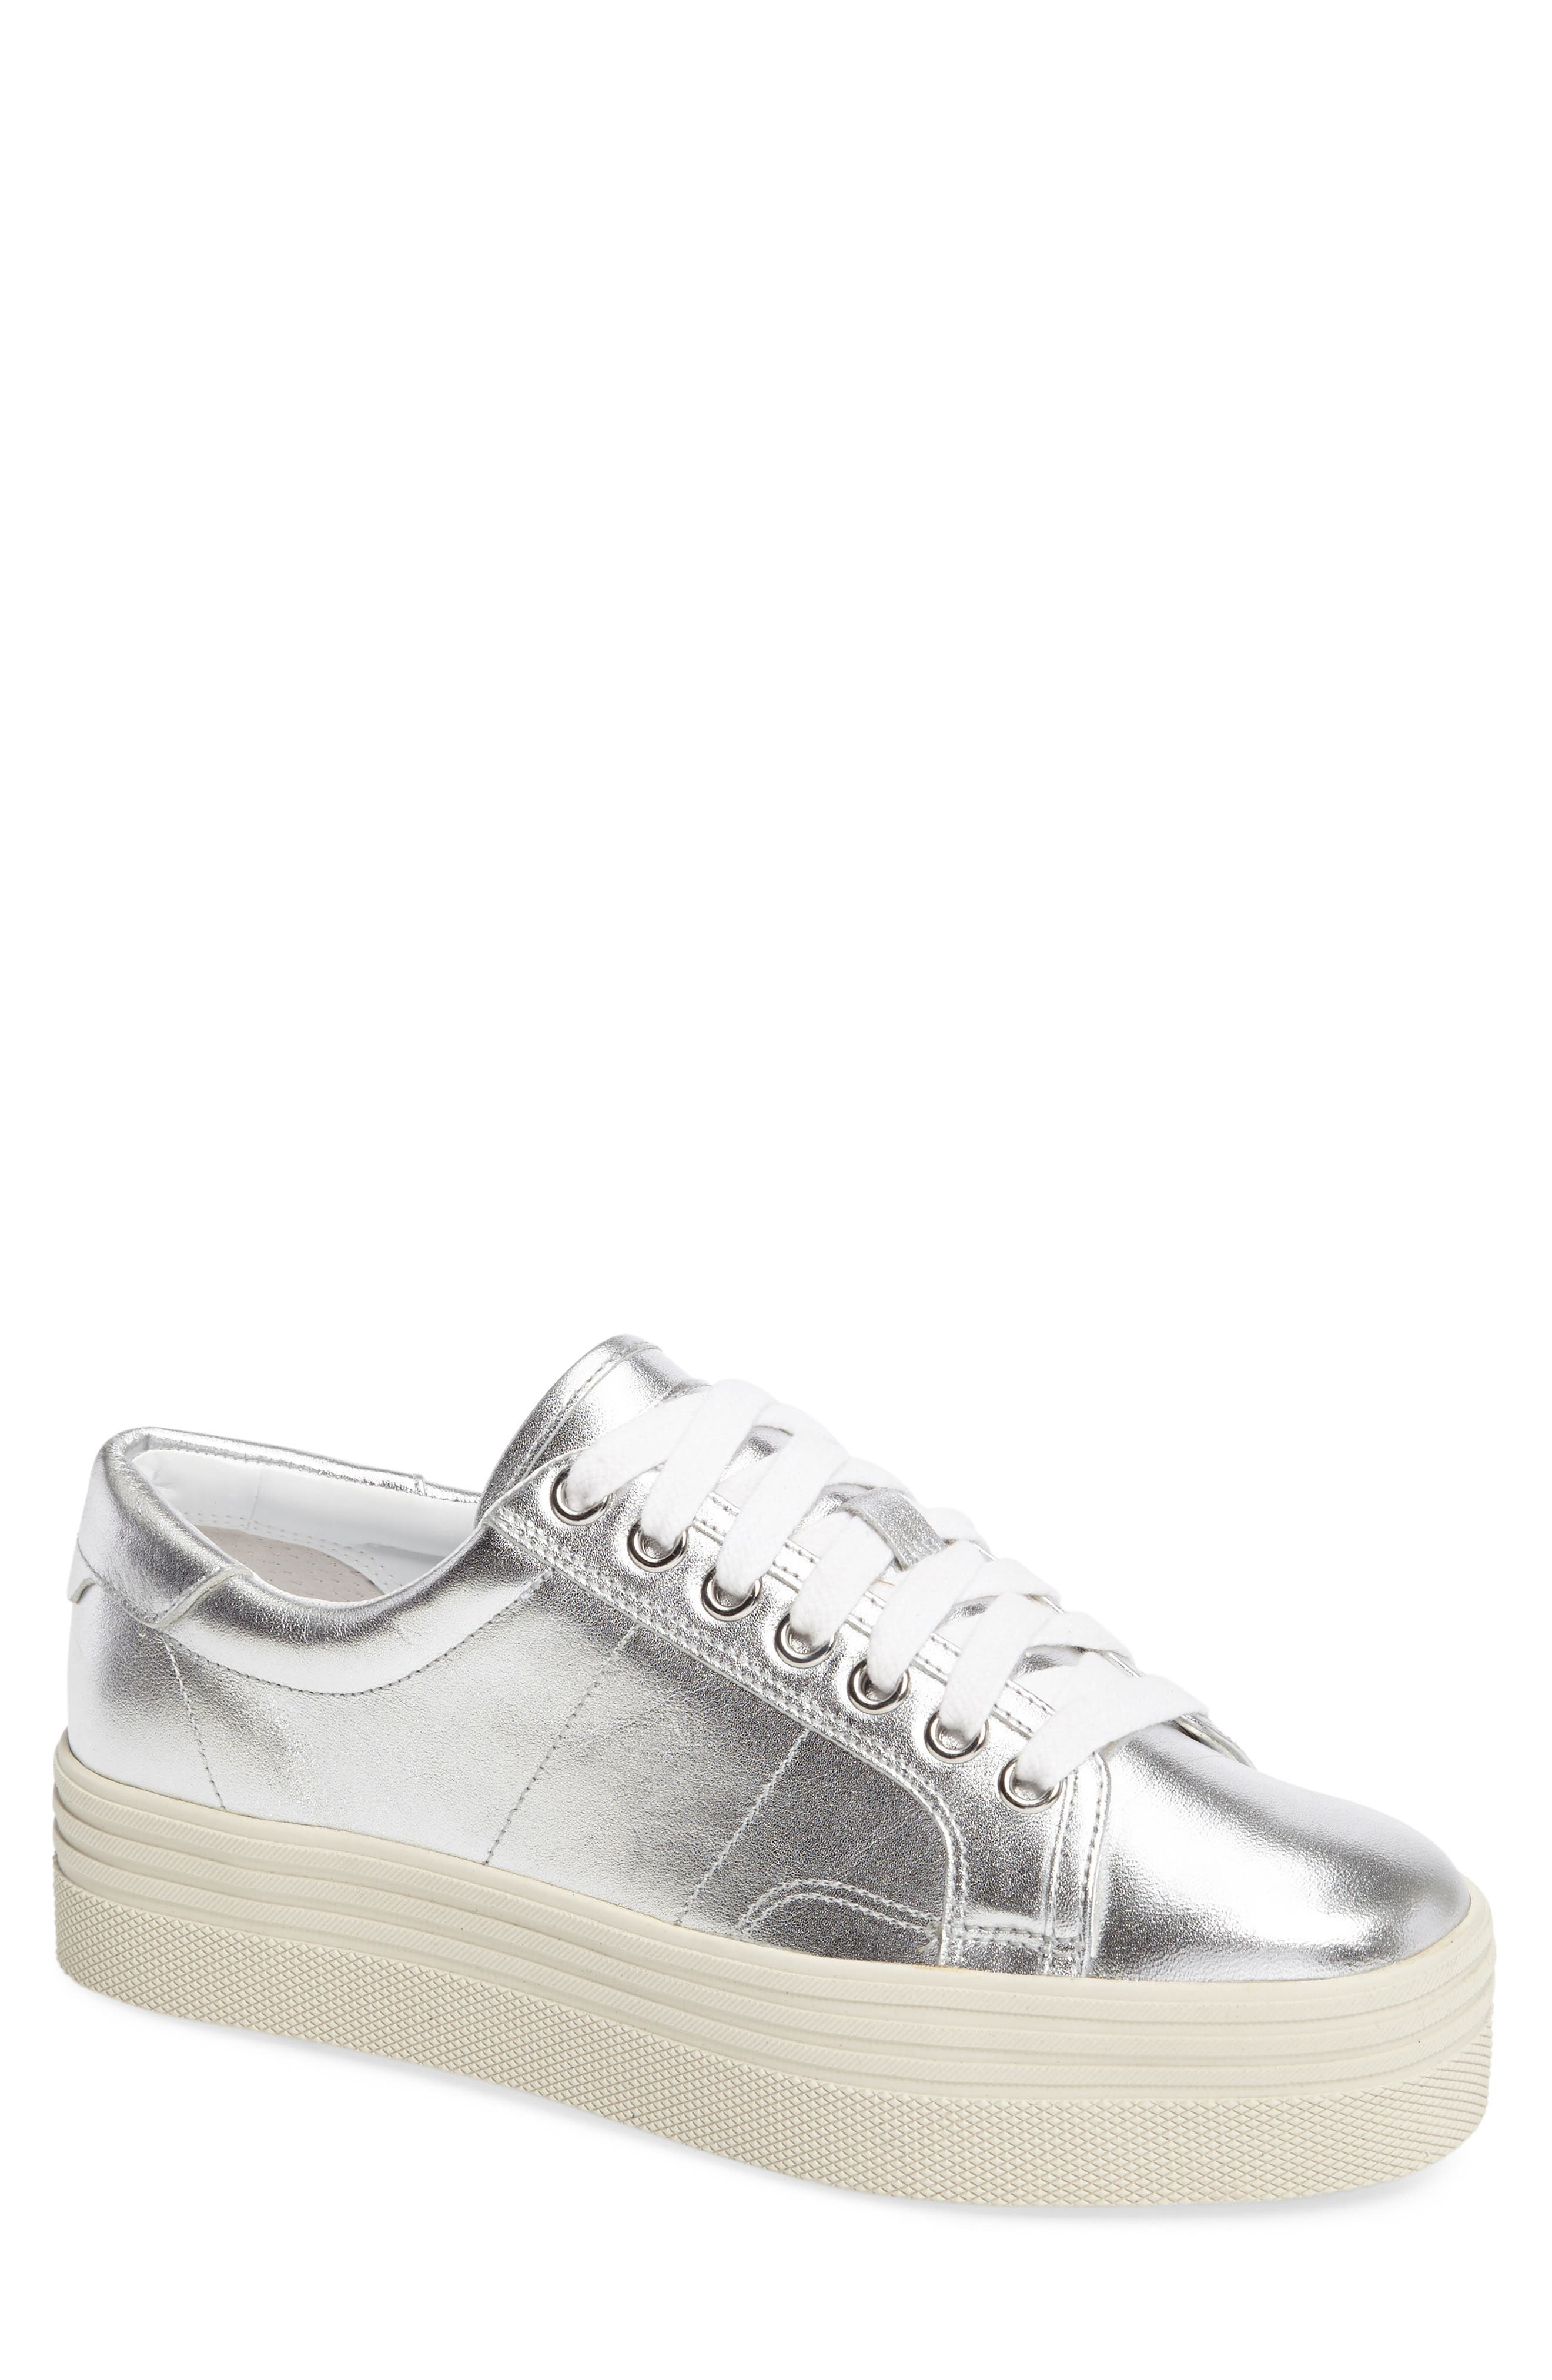 Main Image - Marc Fisher LTD Emmy Platform Sneaker (Women)